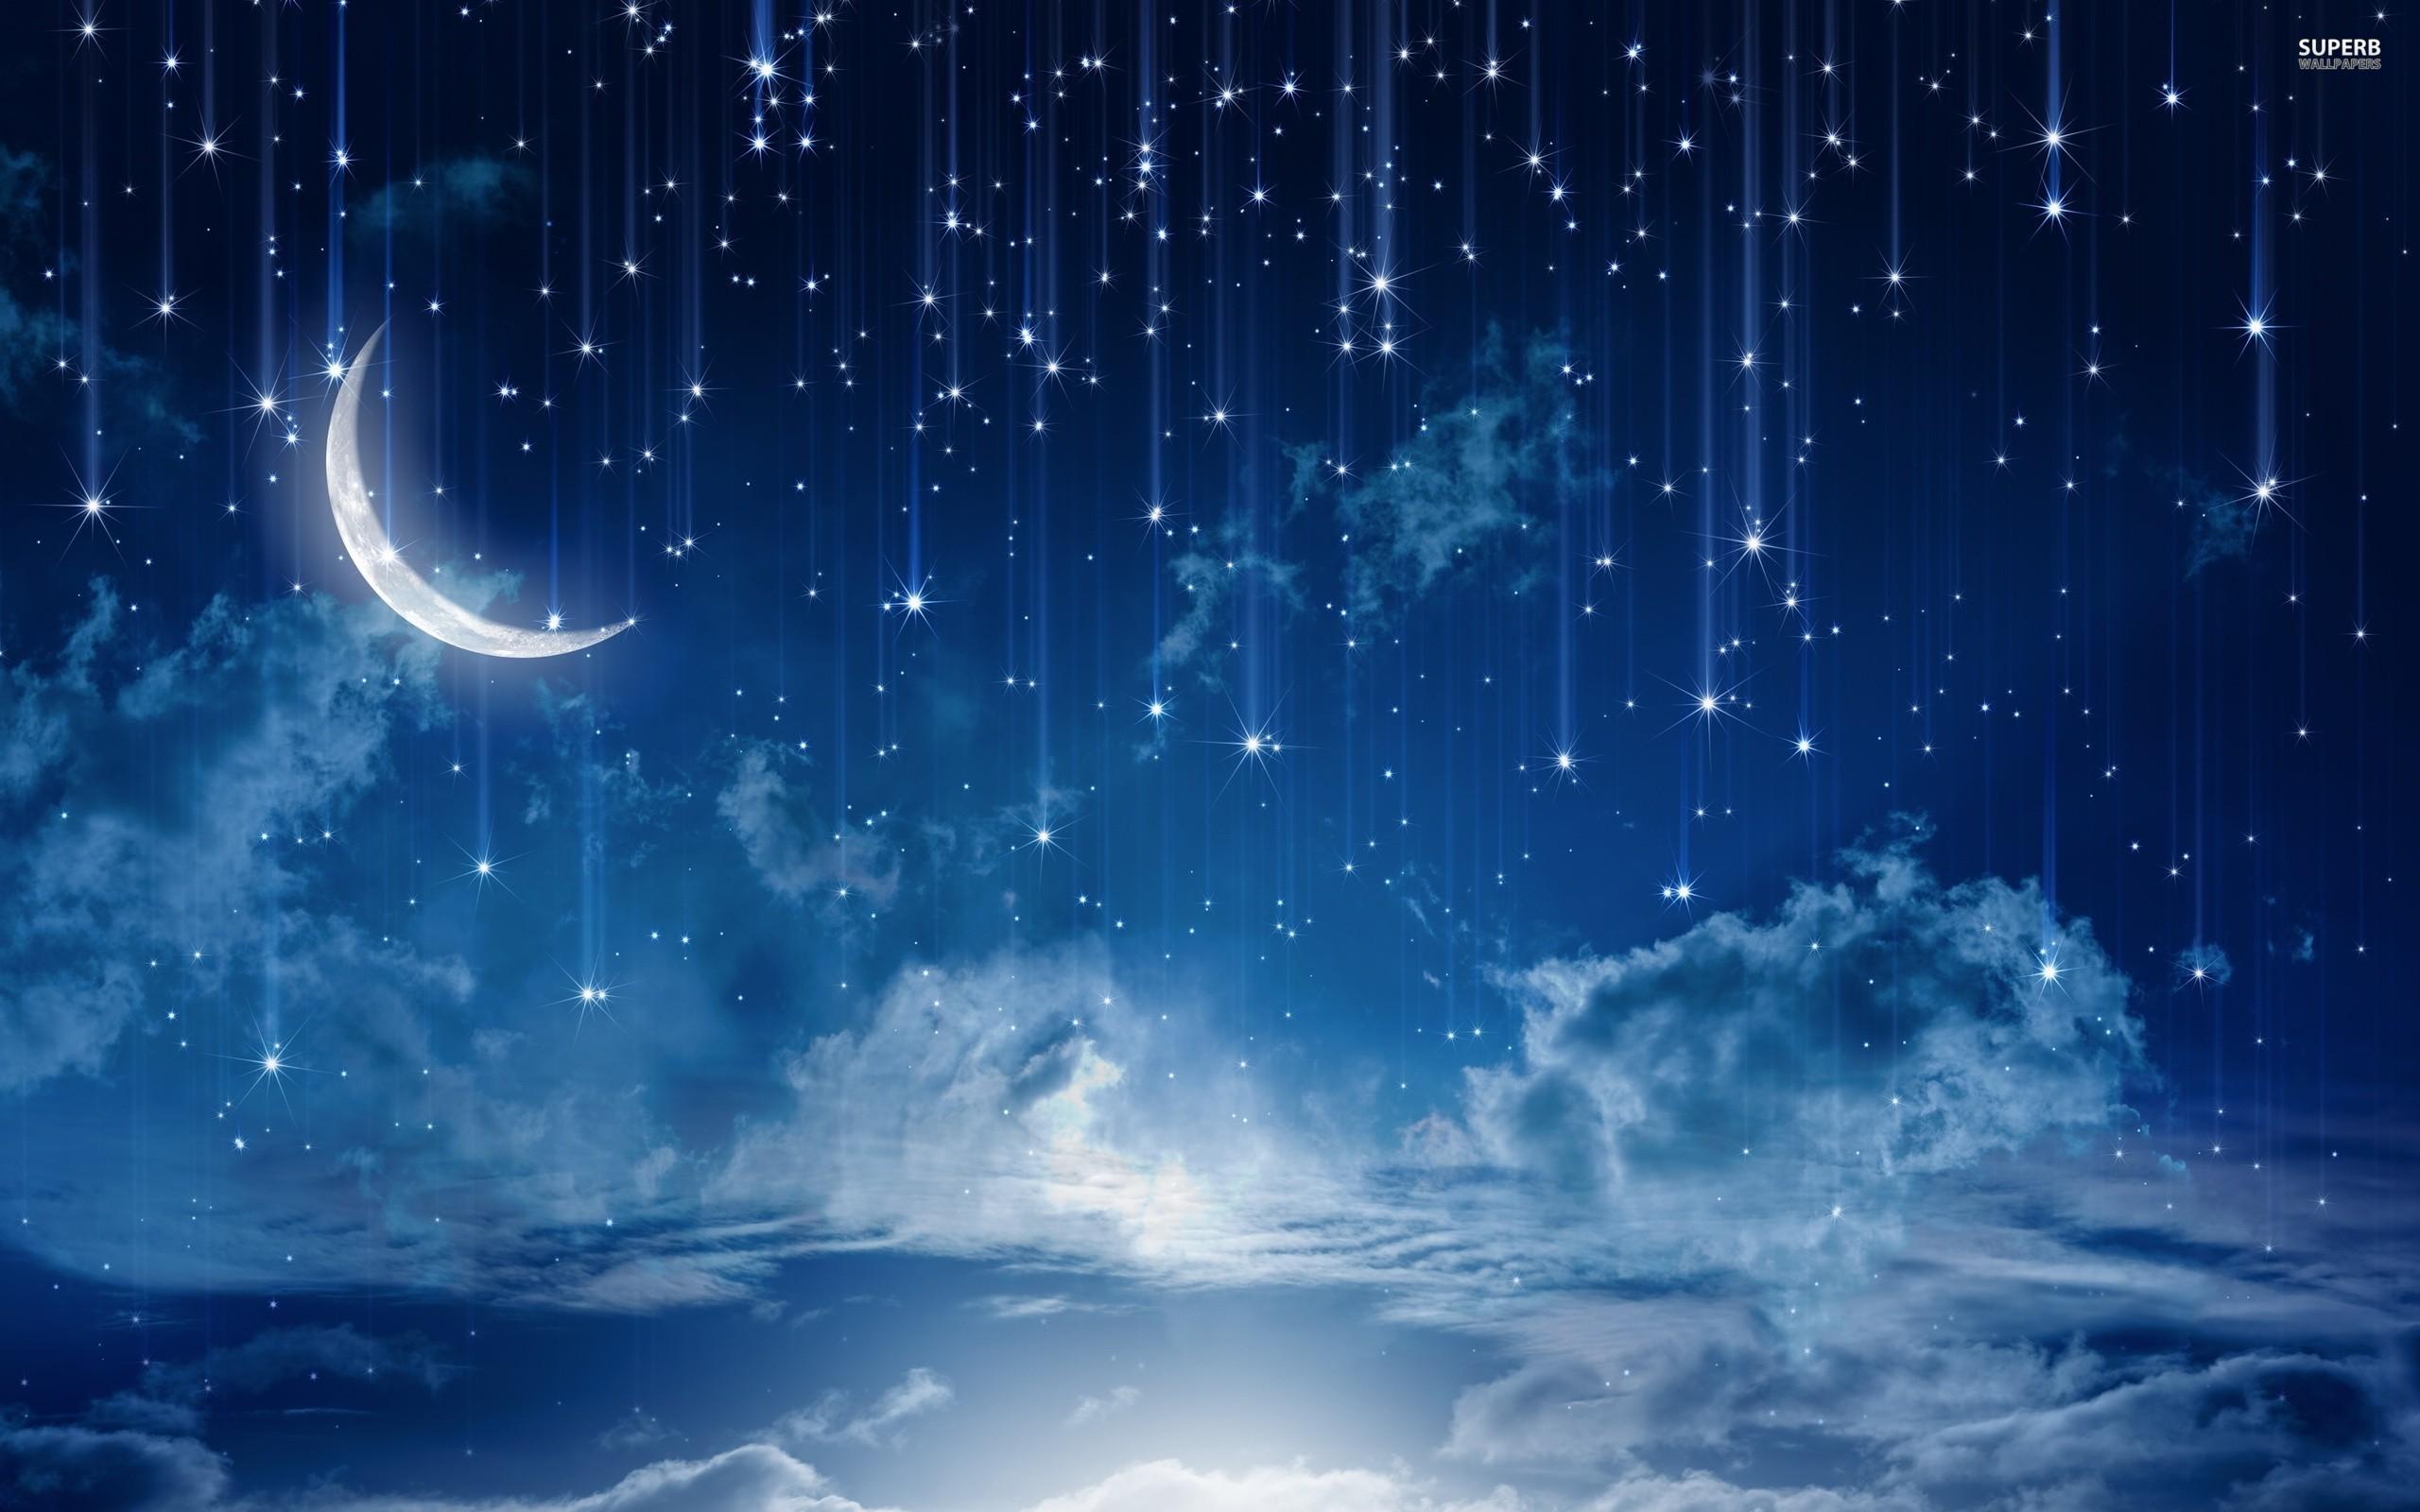 Night Sky Wallpaper 2560x1600 42417